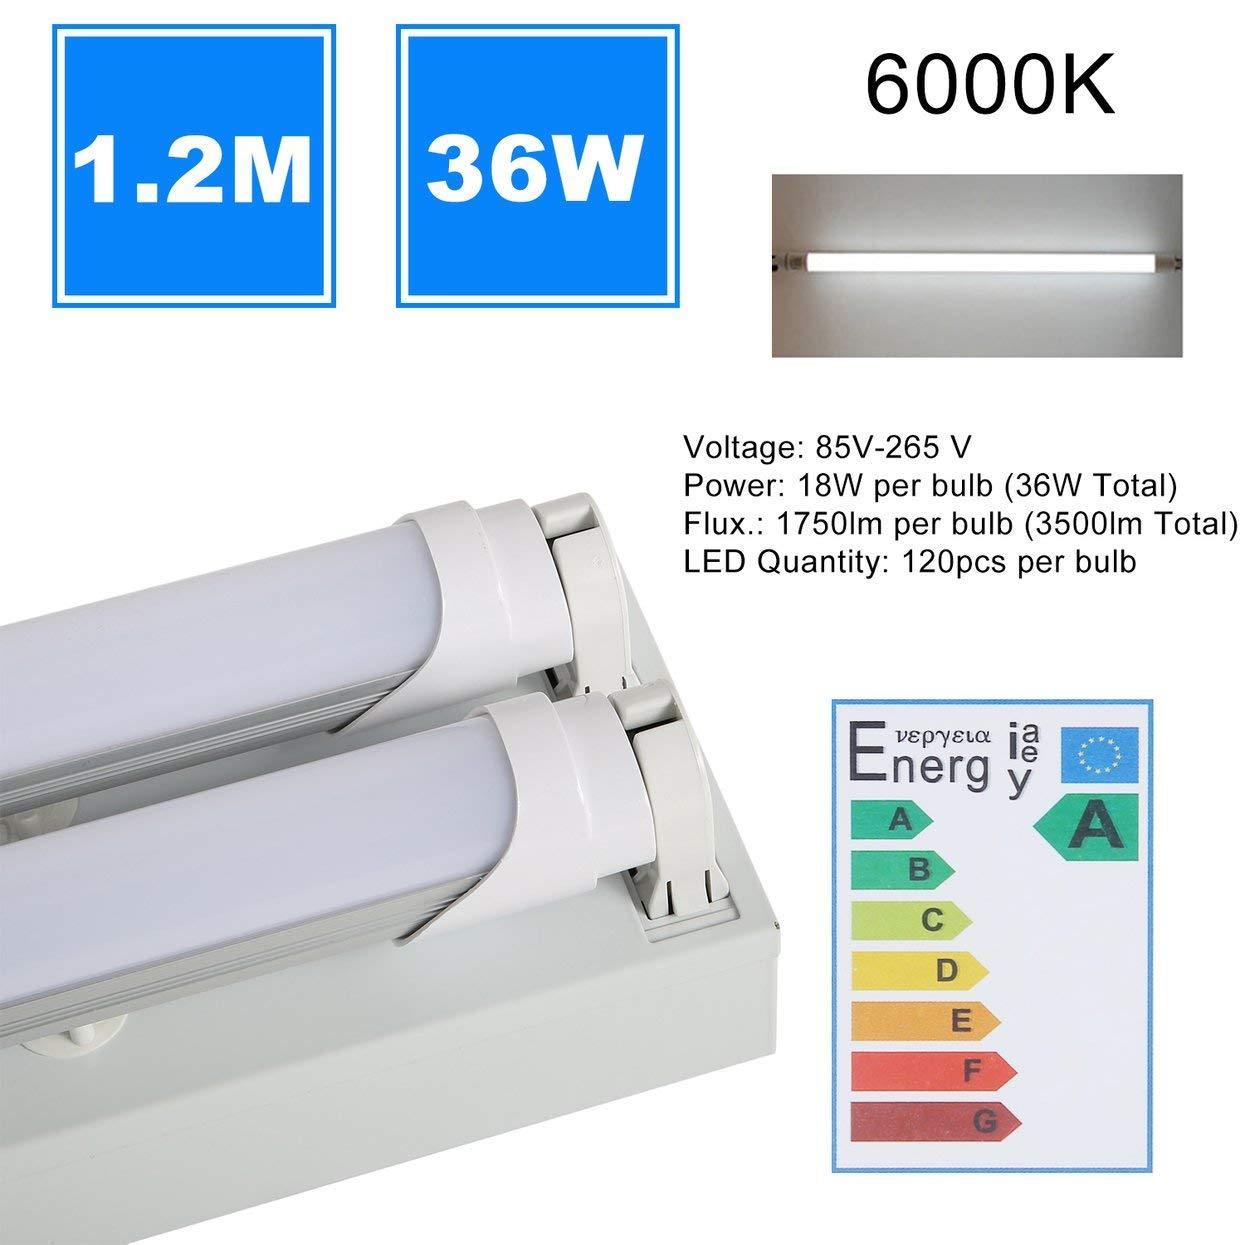 36W 6000K Shop Lamp Durable Garage Grill Light Fixture With 2 PCS T8 Tube Lights 1.2M Super Bright Warehouse Light